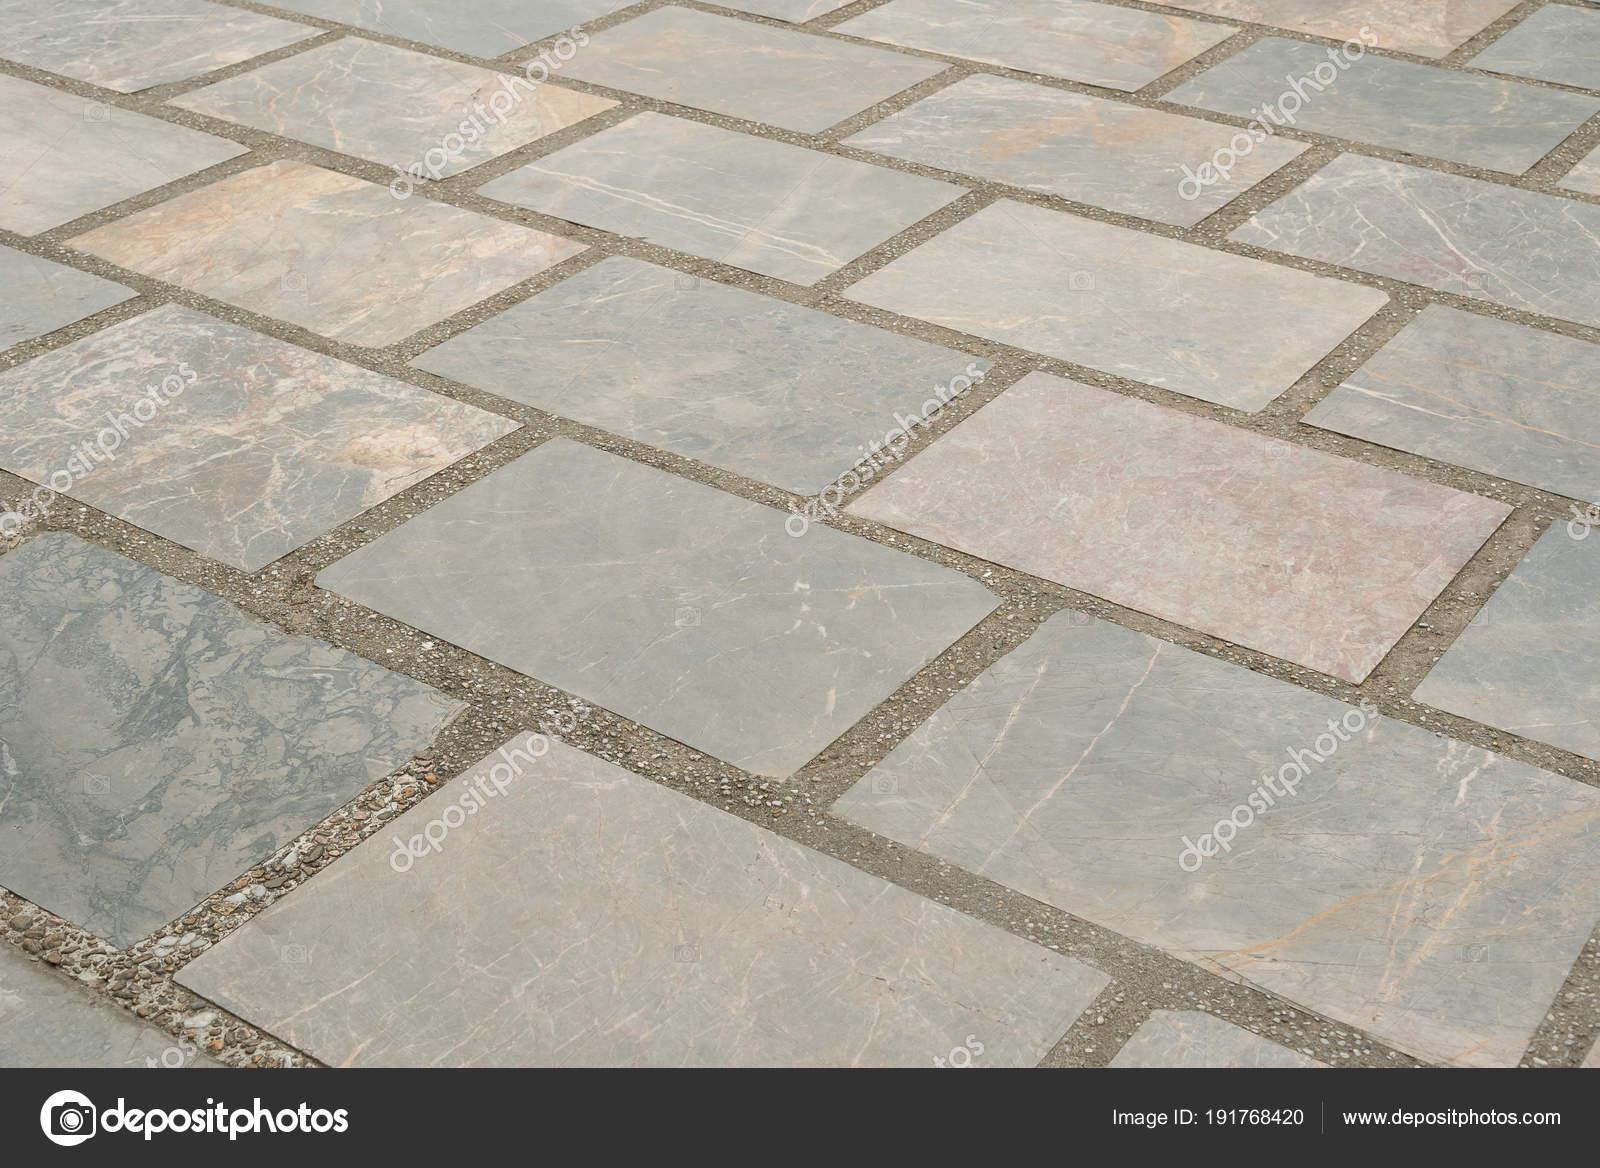 Texture Or Pattern Of Marble Floor Stock Photo C Fotolismthai 191768420